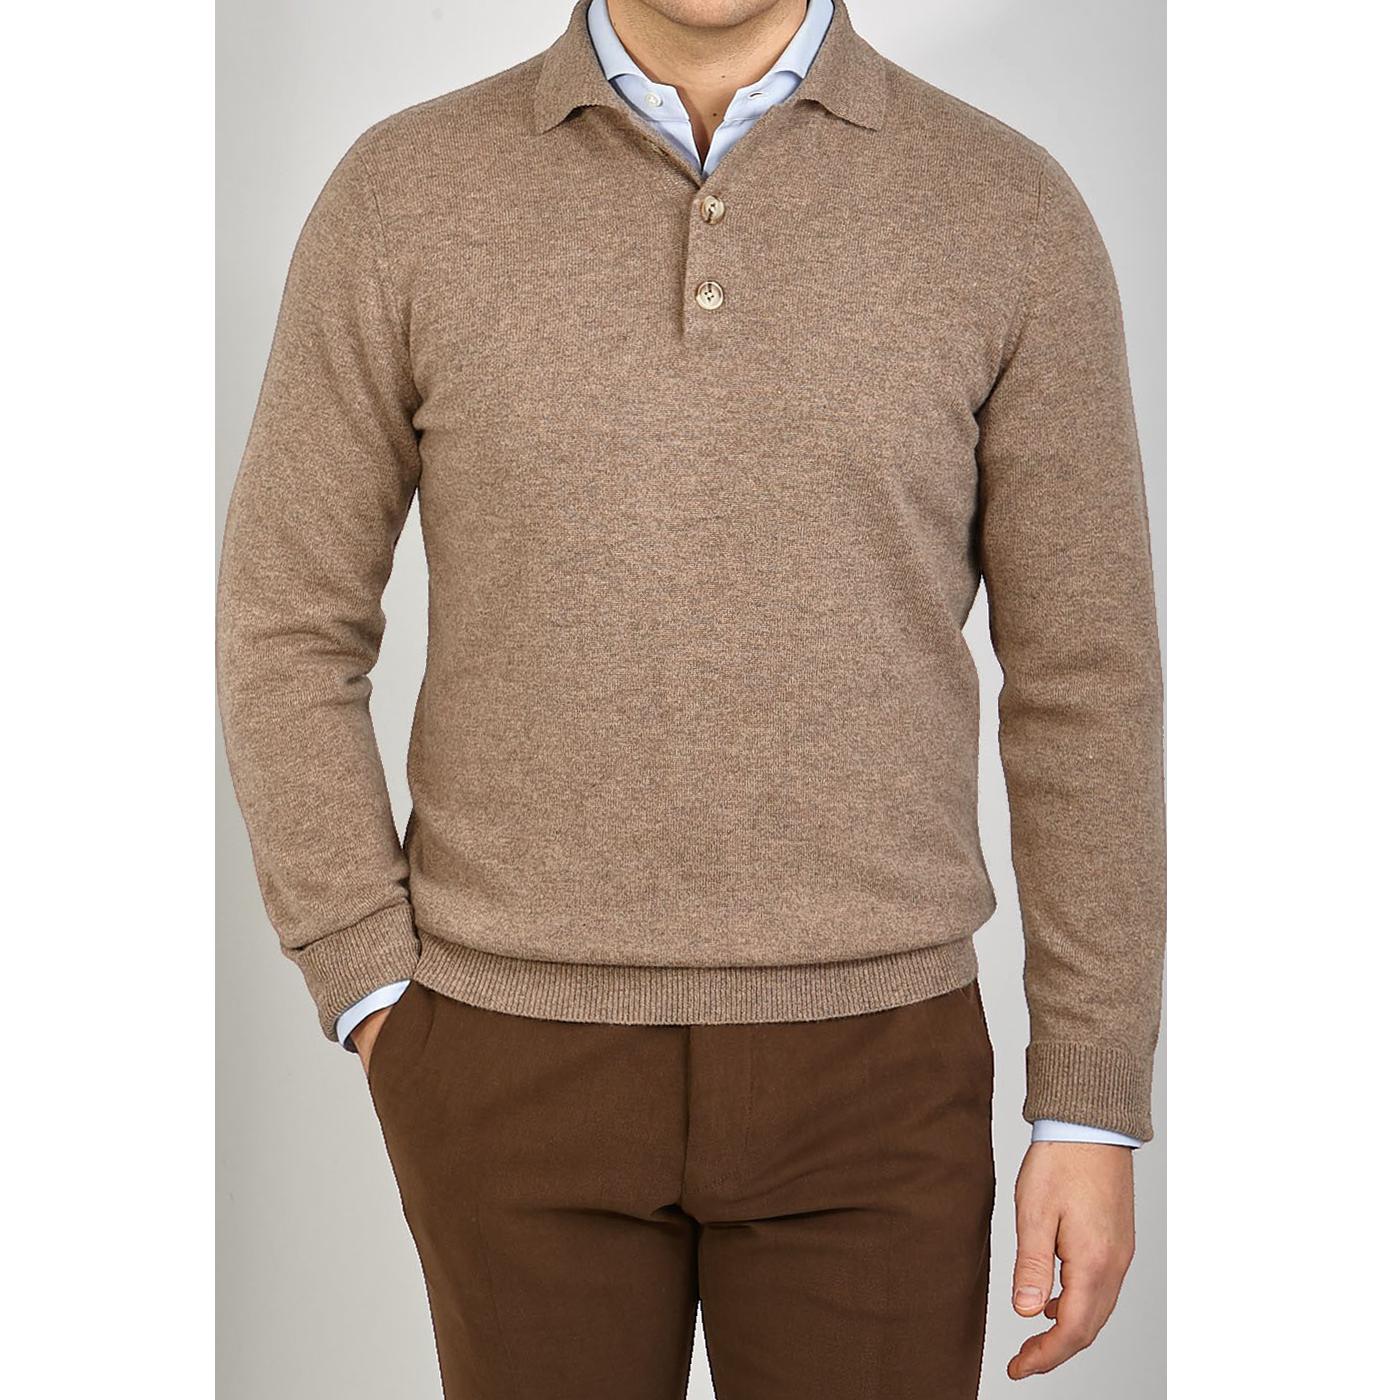 Davida Mink Beige Cashmere Polo Shirt Front